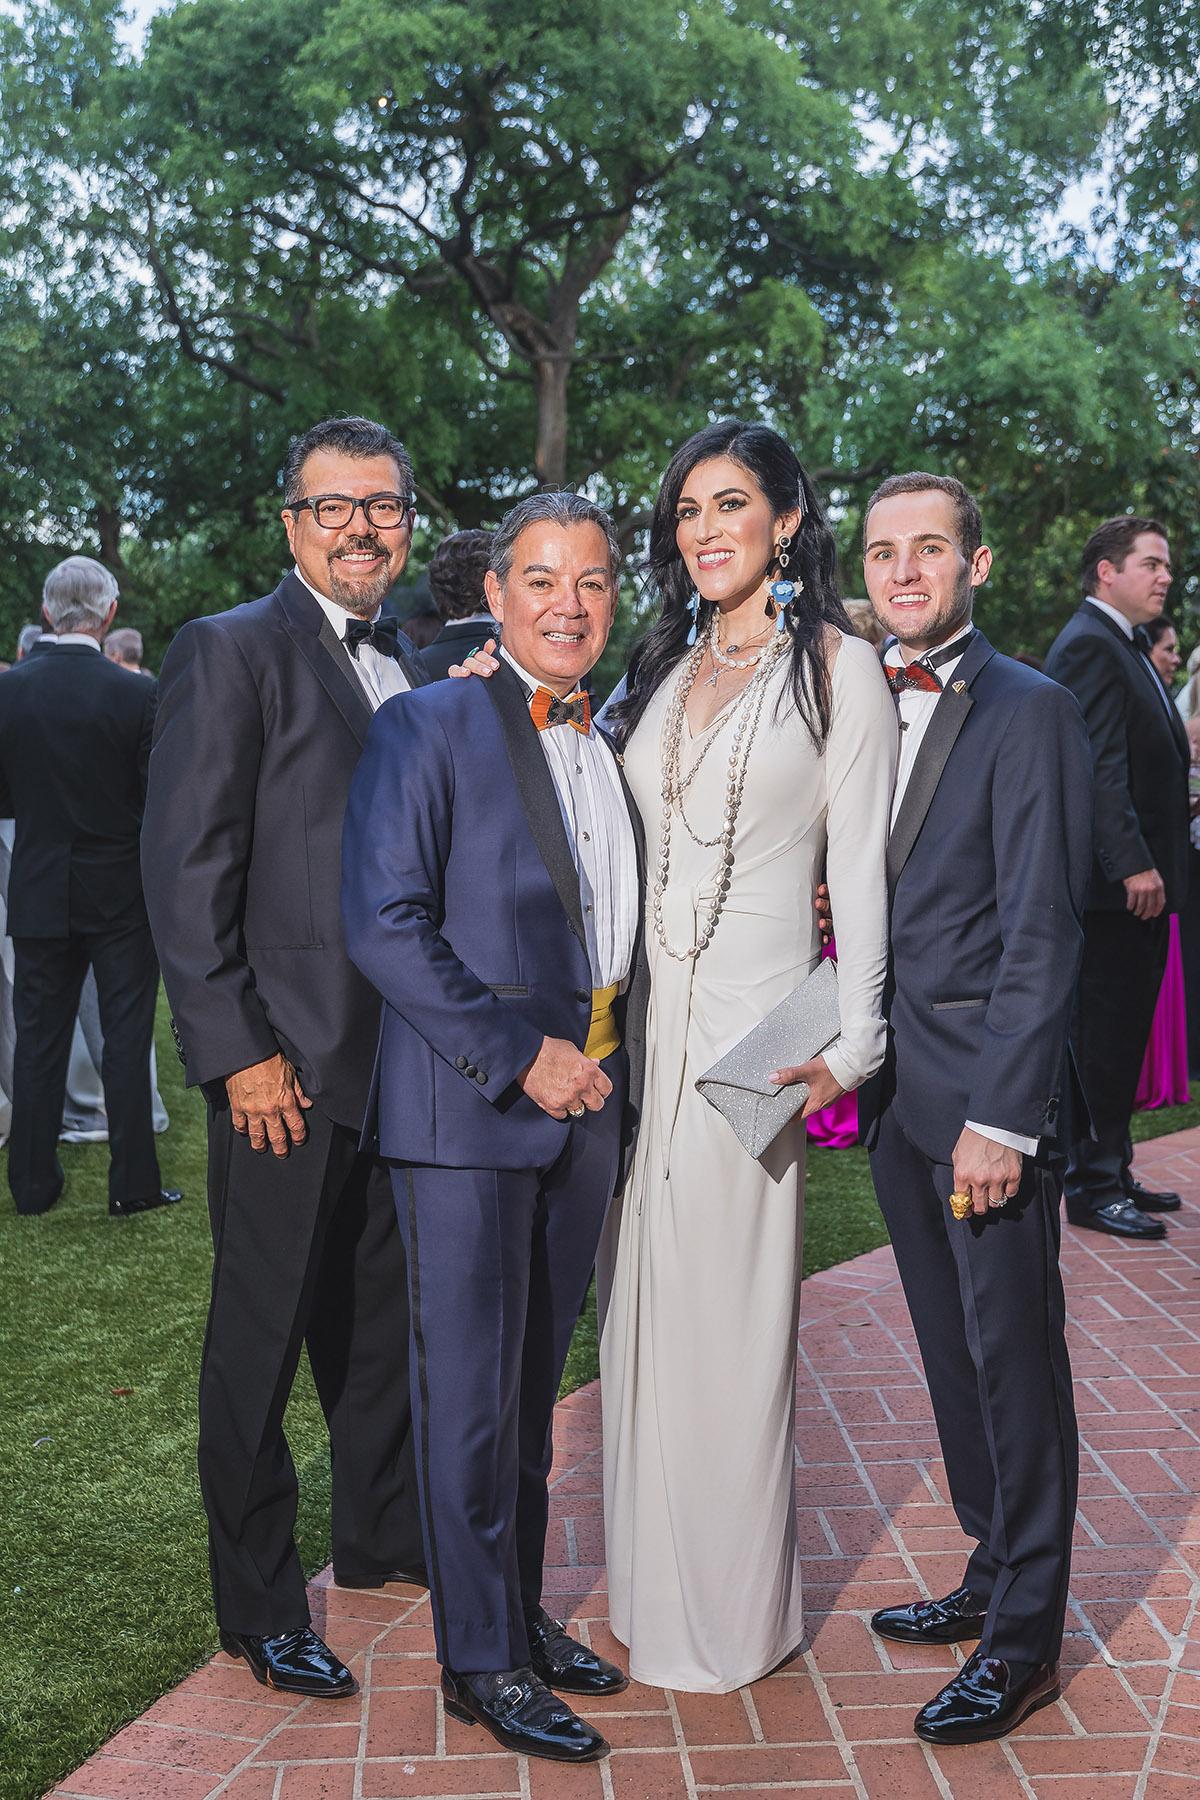 Ramiro Salazar, Epitacio Resendez, Xitlalt Herrera-Salazar and Hunter Henke